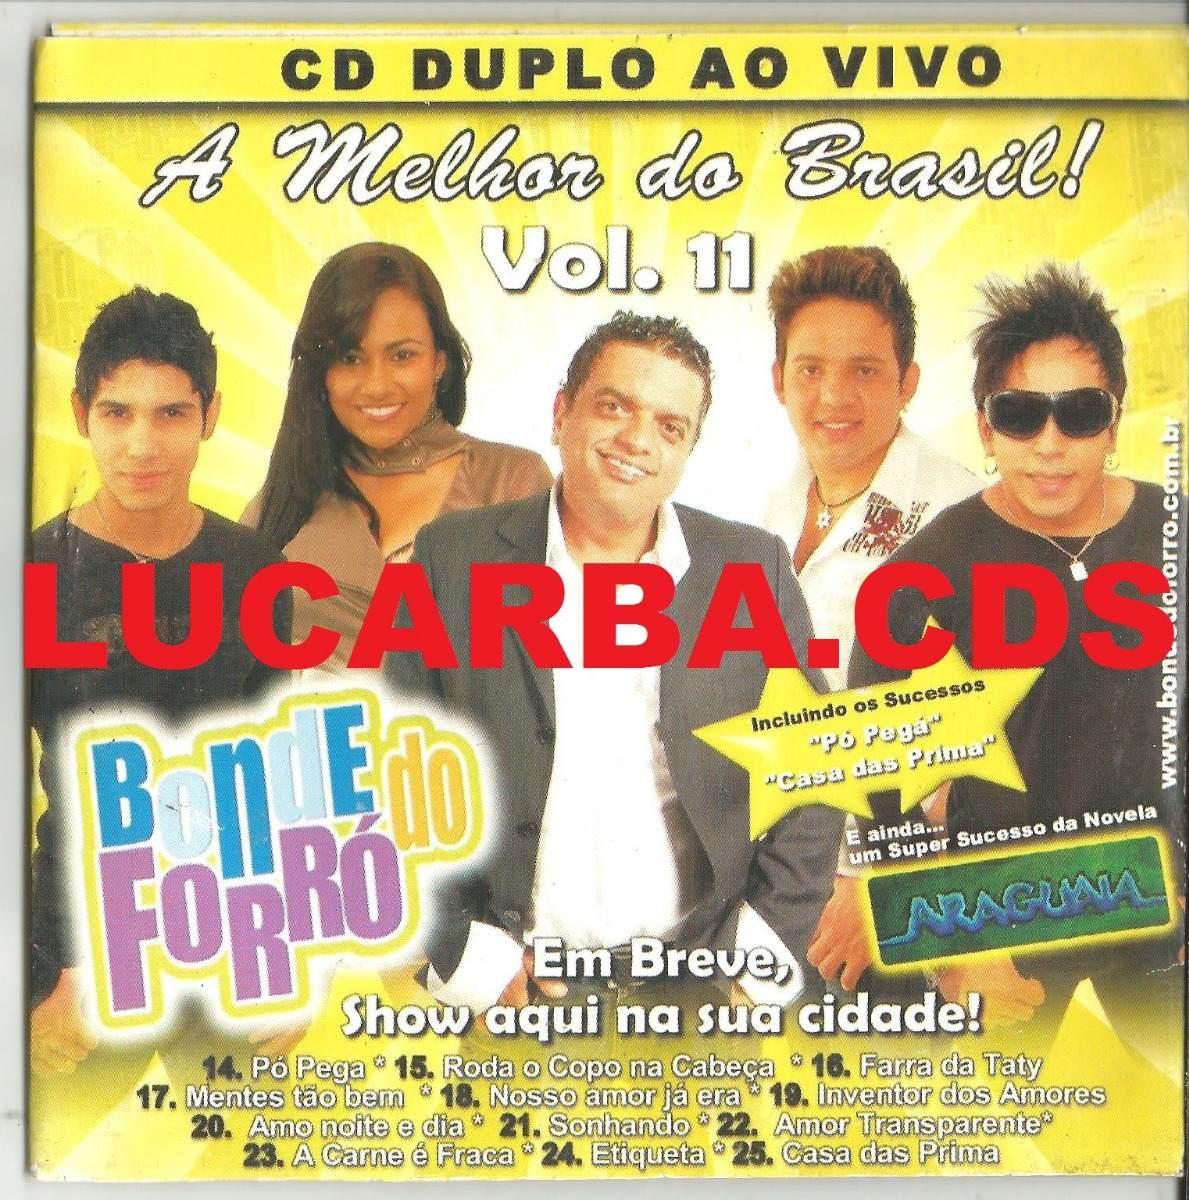 DO DJ KILESSE CD DJ BAIXAR E BUDU